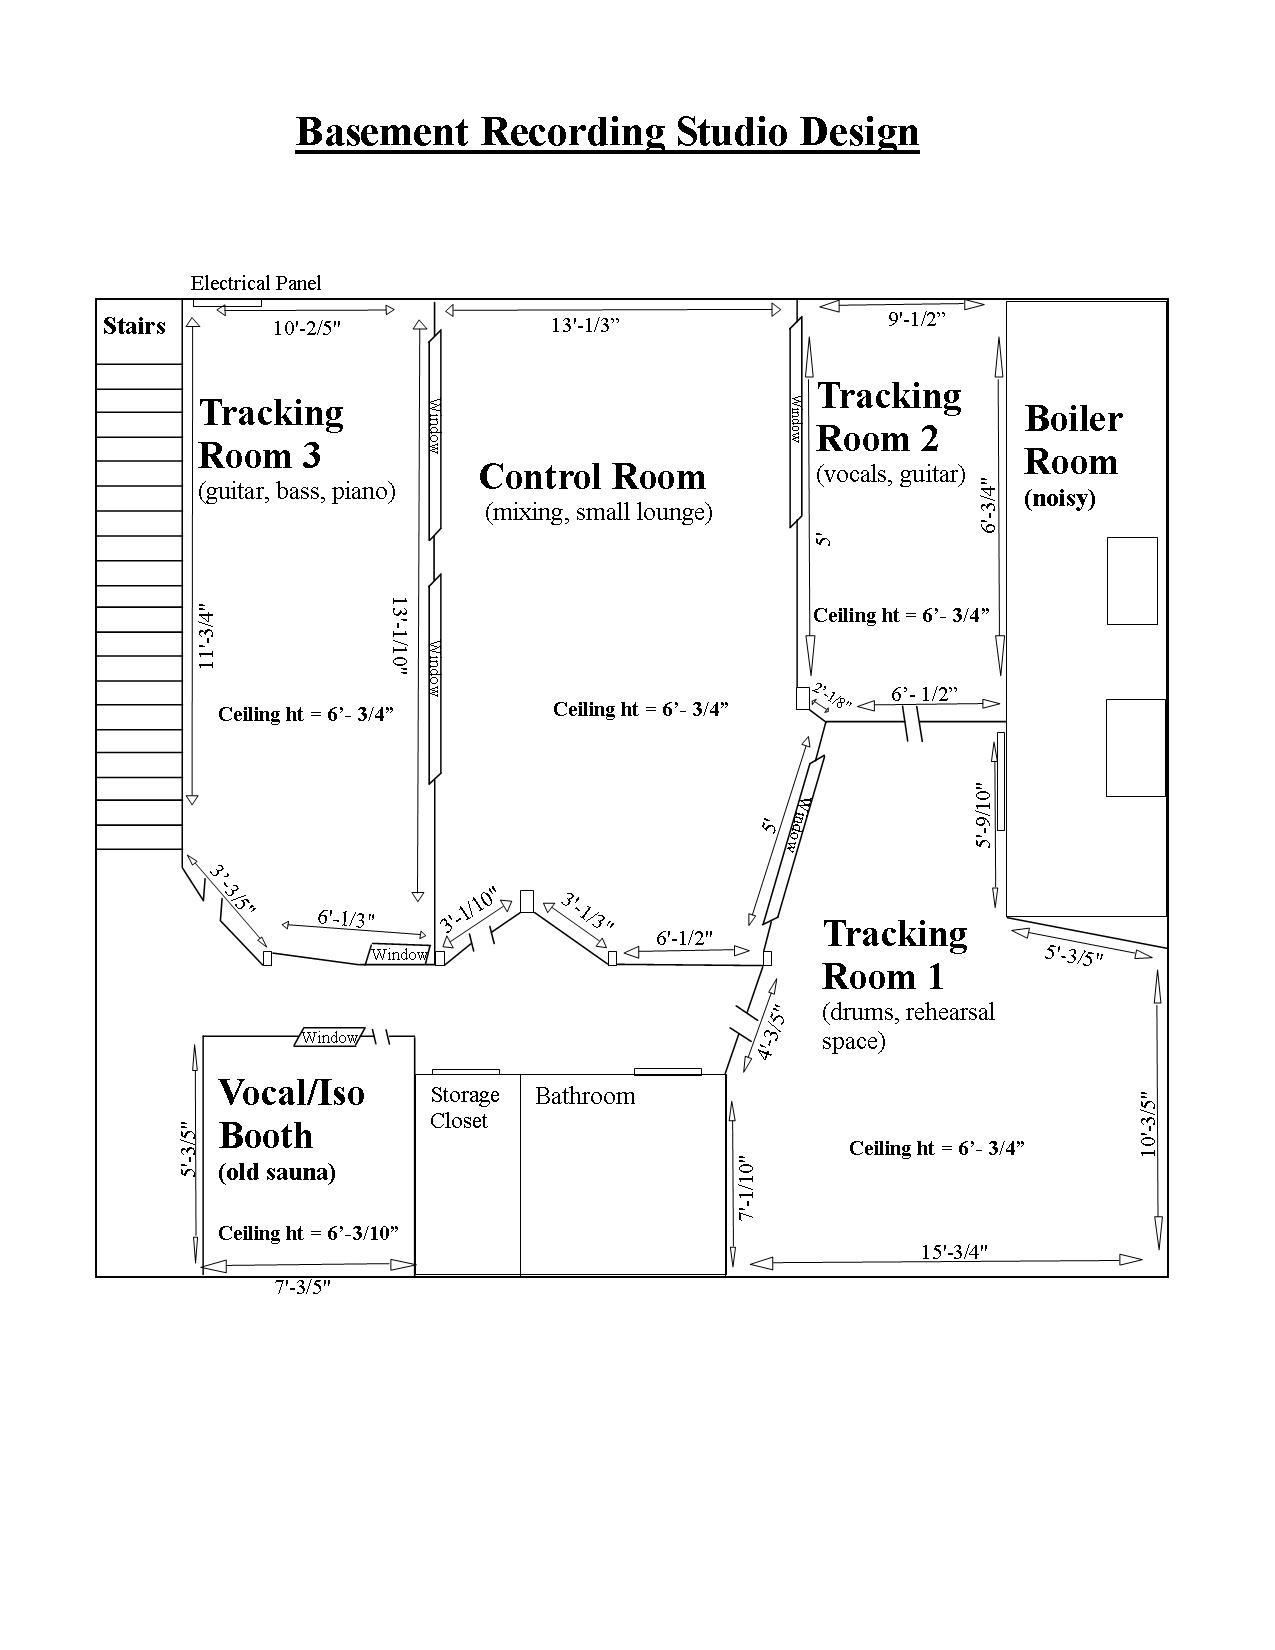 Music Studio Room Design: Studio Design And Wiring Scheme, Need Help!